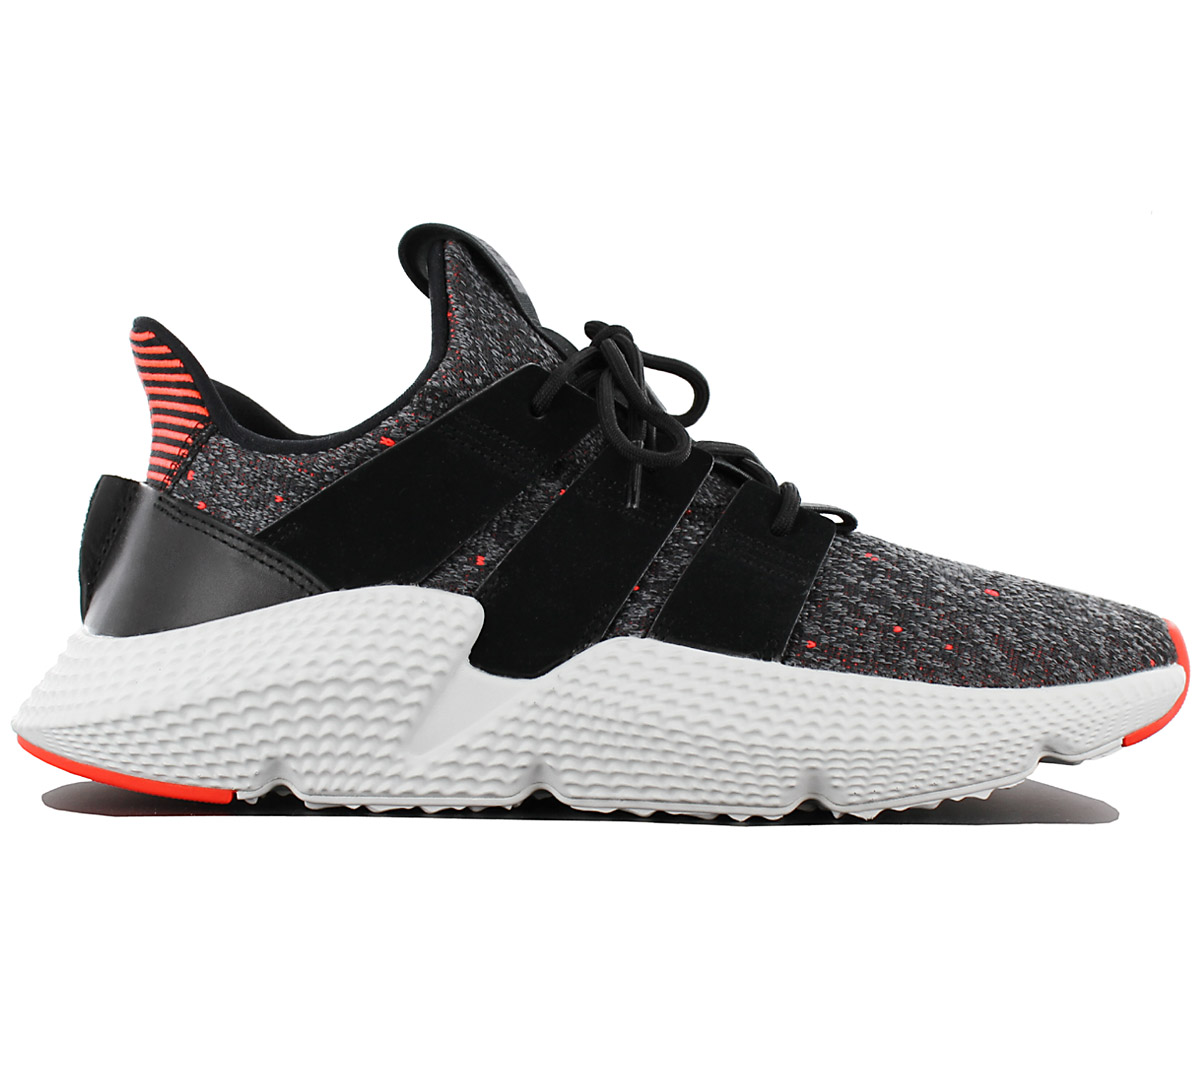 0534dc4d9861 Adidas Originals Prophere Sneaker Mens Shoes Trainers Black New ...